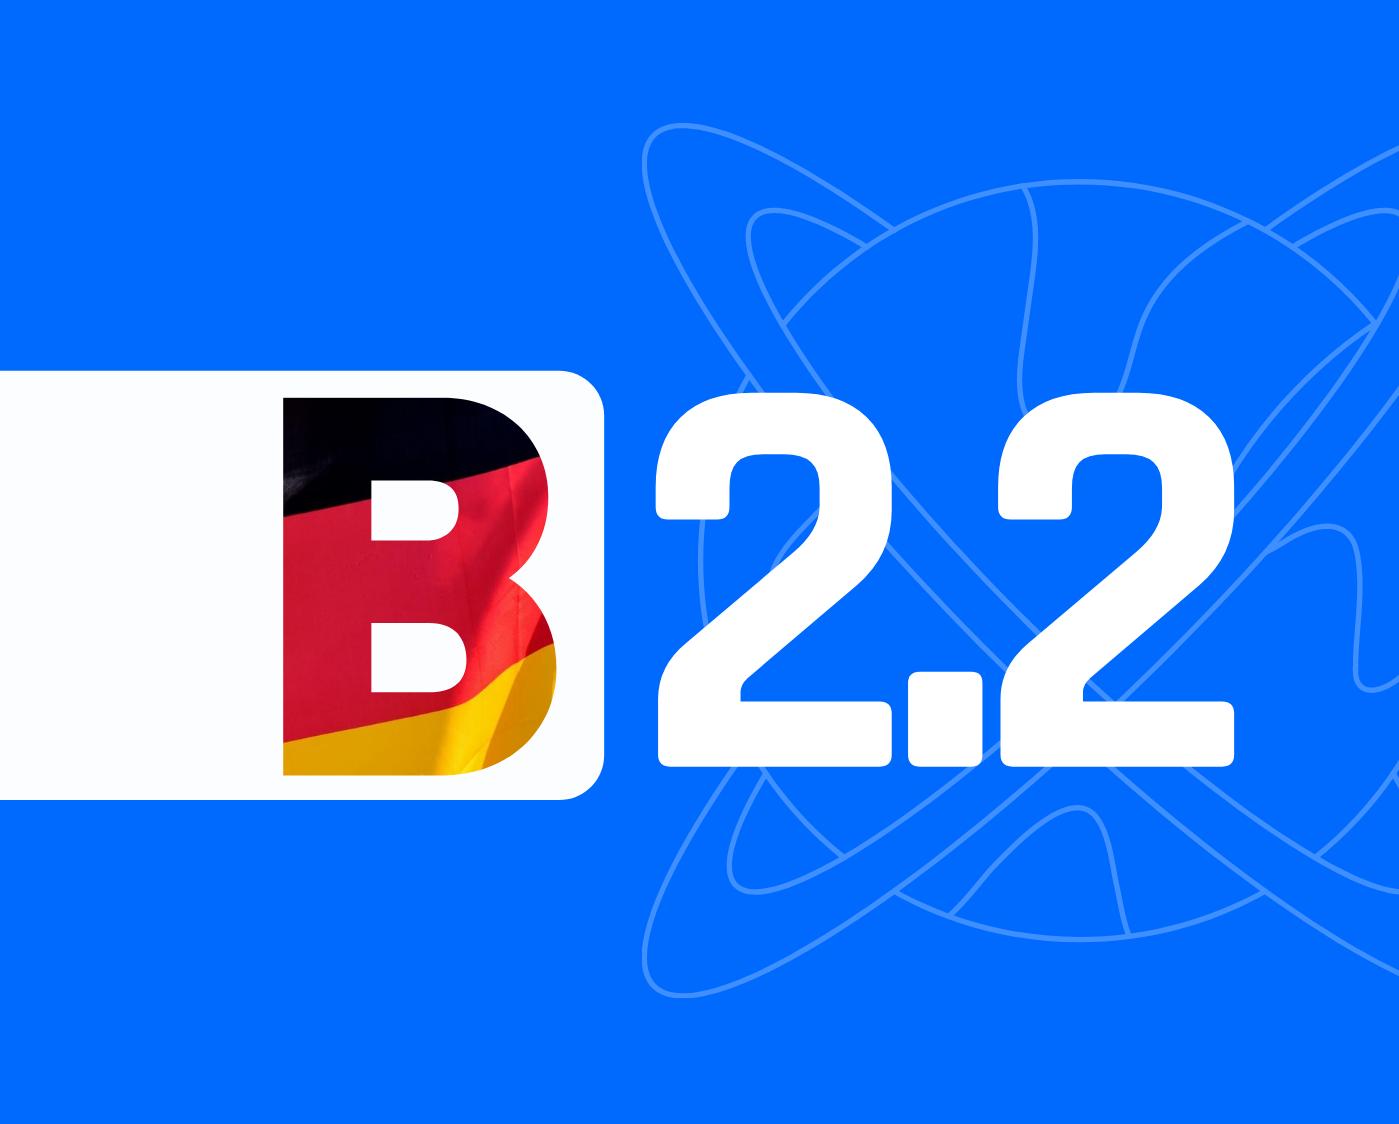 Јазичен  степен B2.2  –  За возрасни